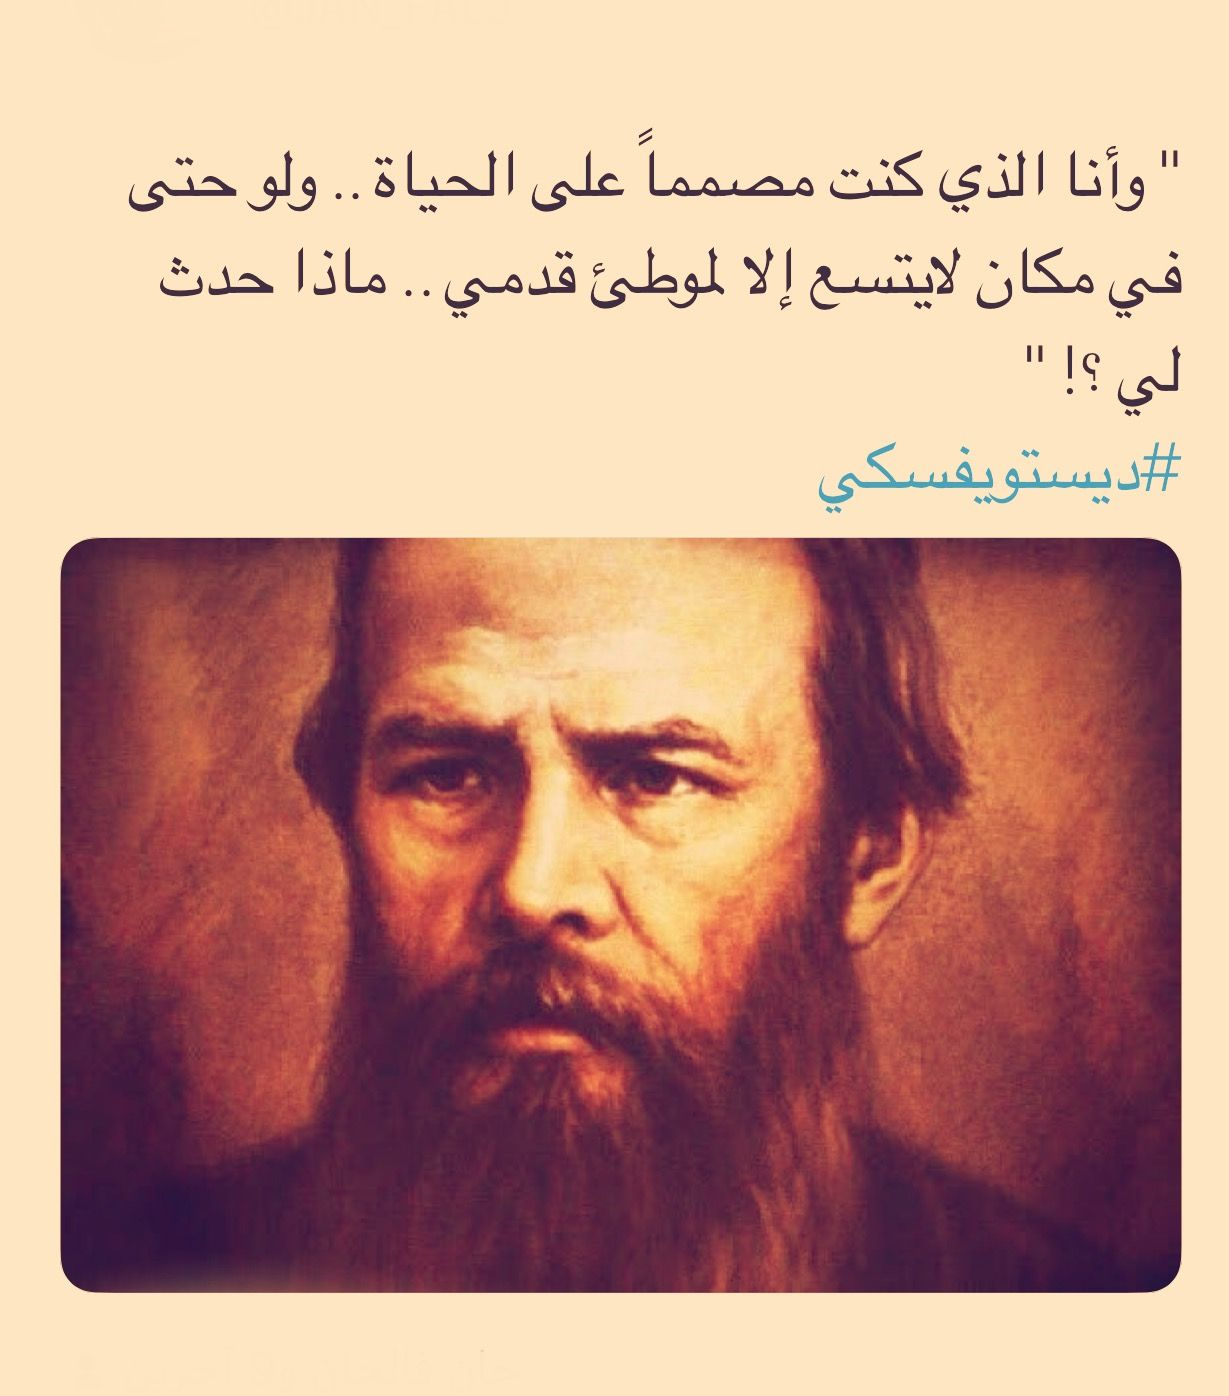 اقتباسات ديستويفسكي Wisdom Quotes Quotes Arabic Books